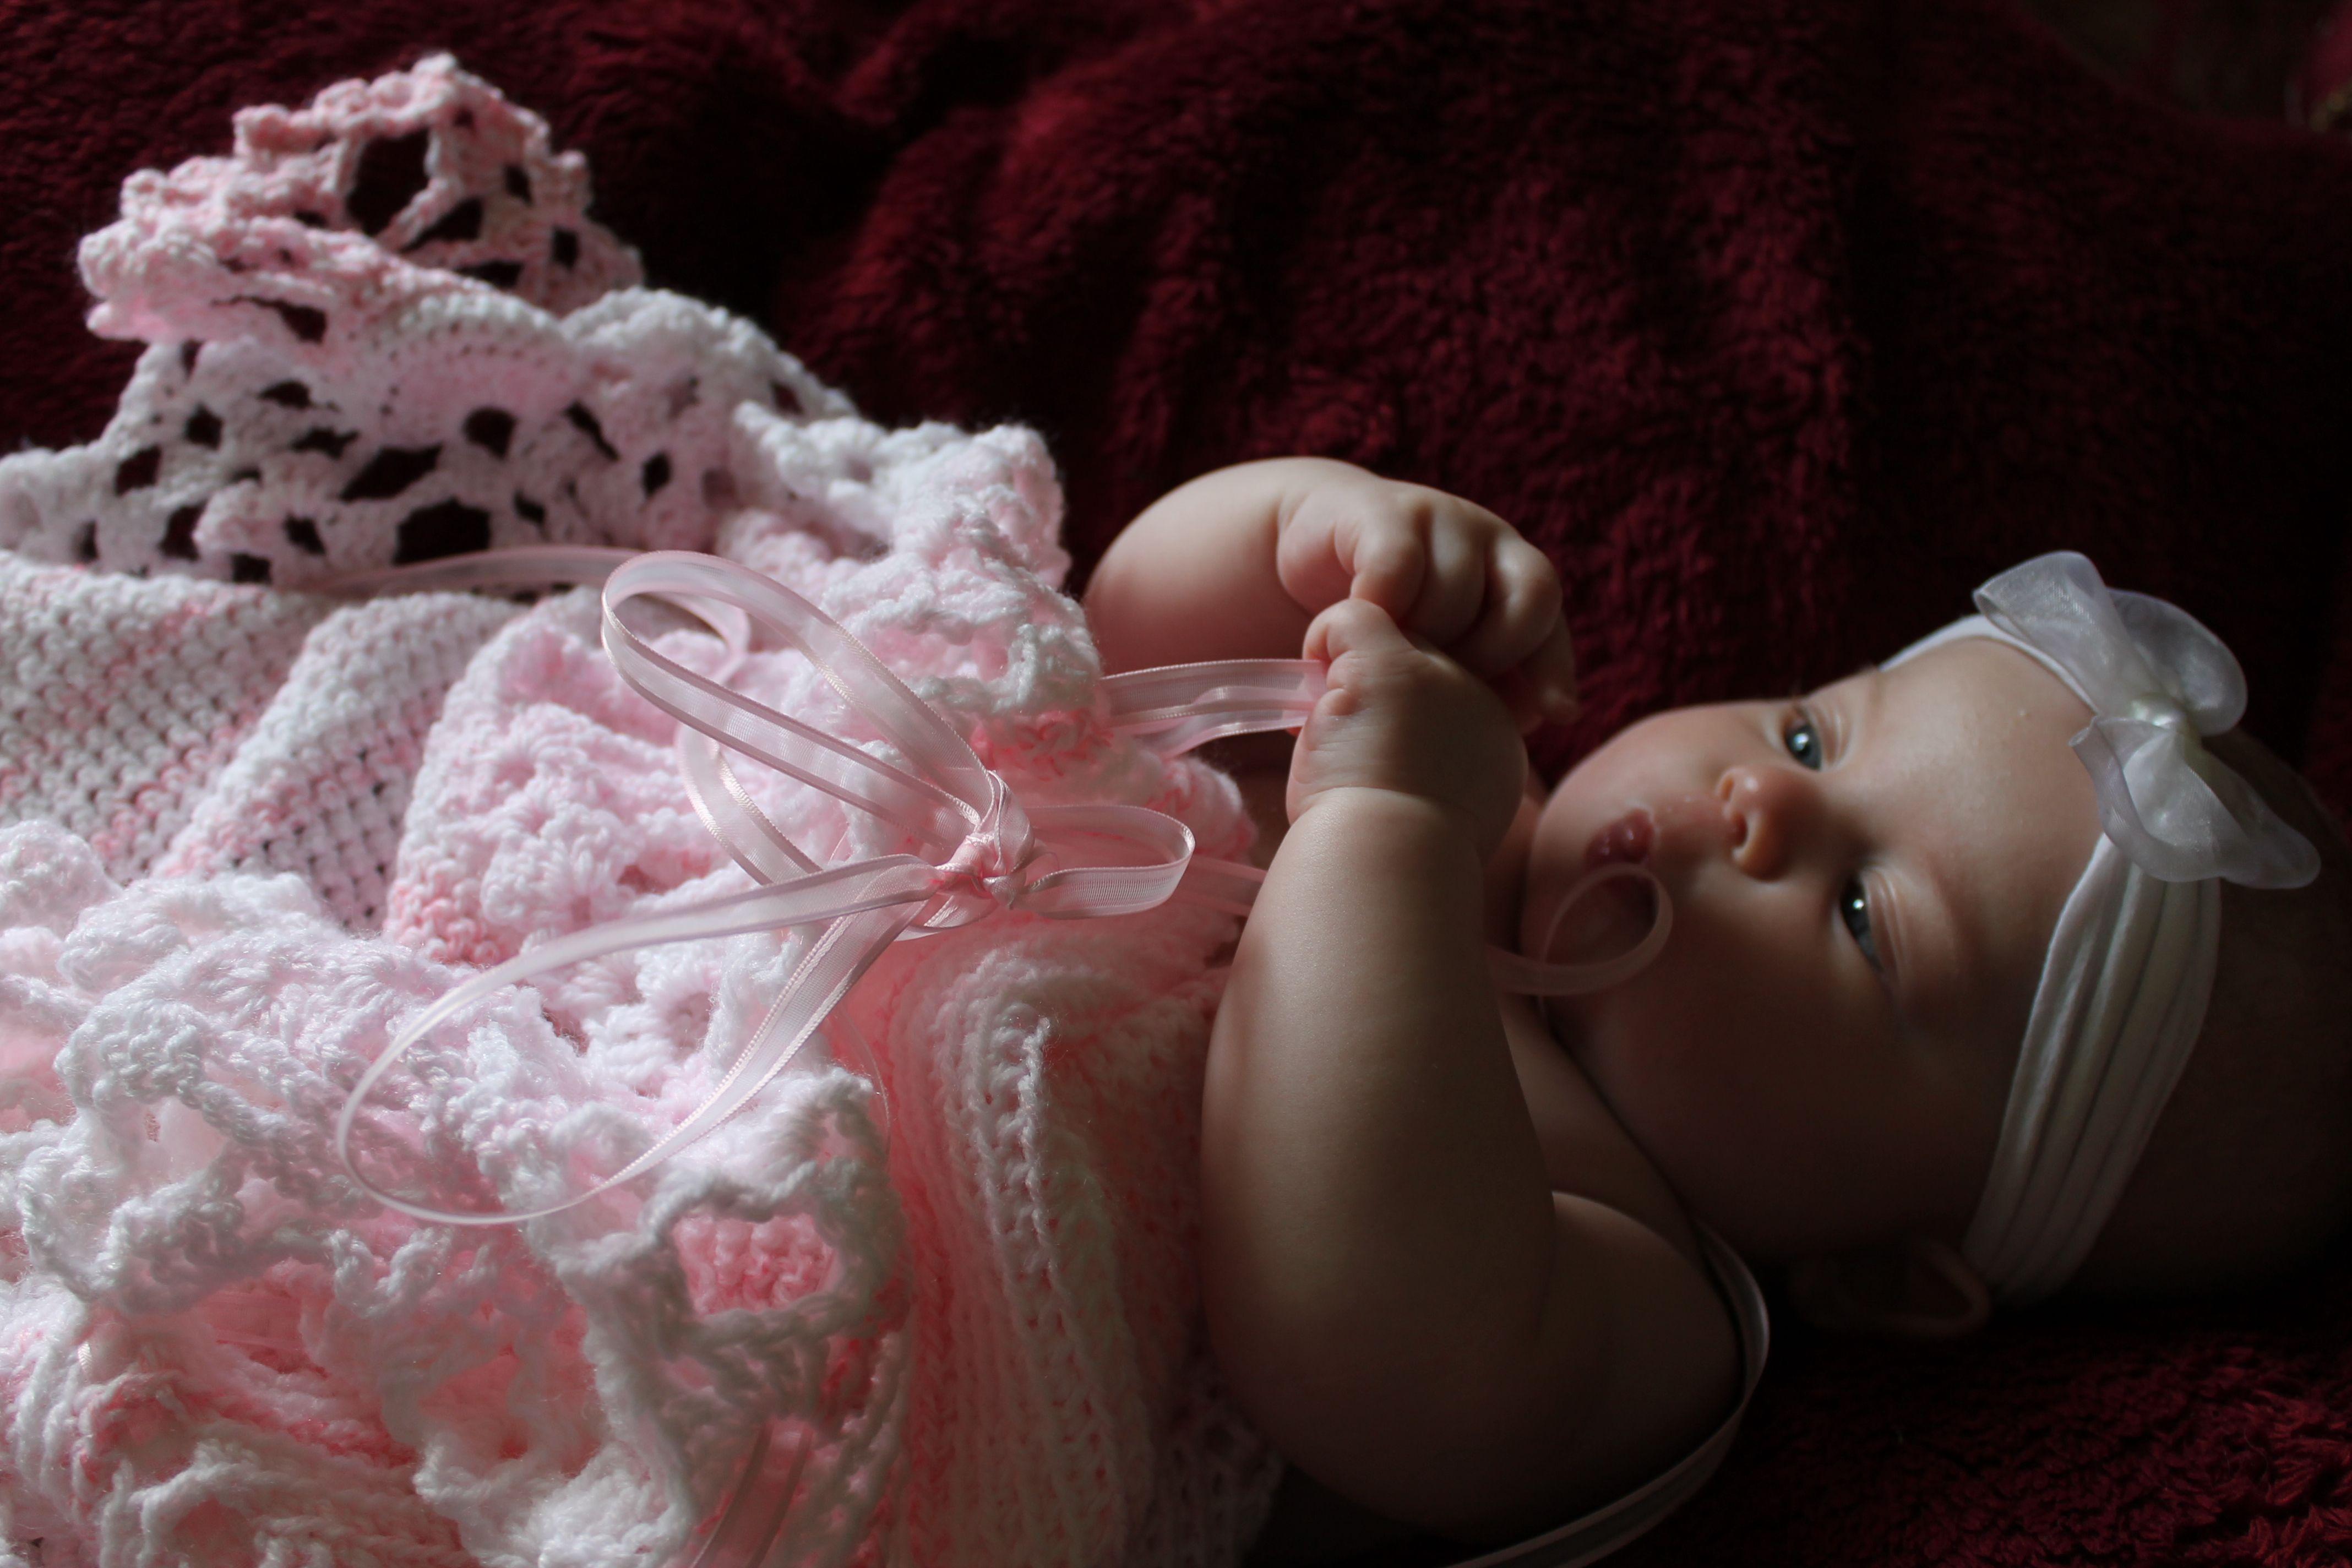 aubrey belle | pictures i love! | pinterest | belle and aubrey o'day